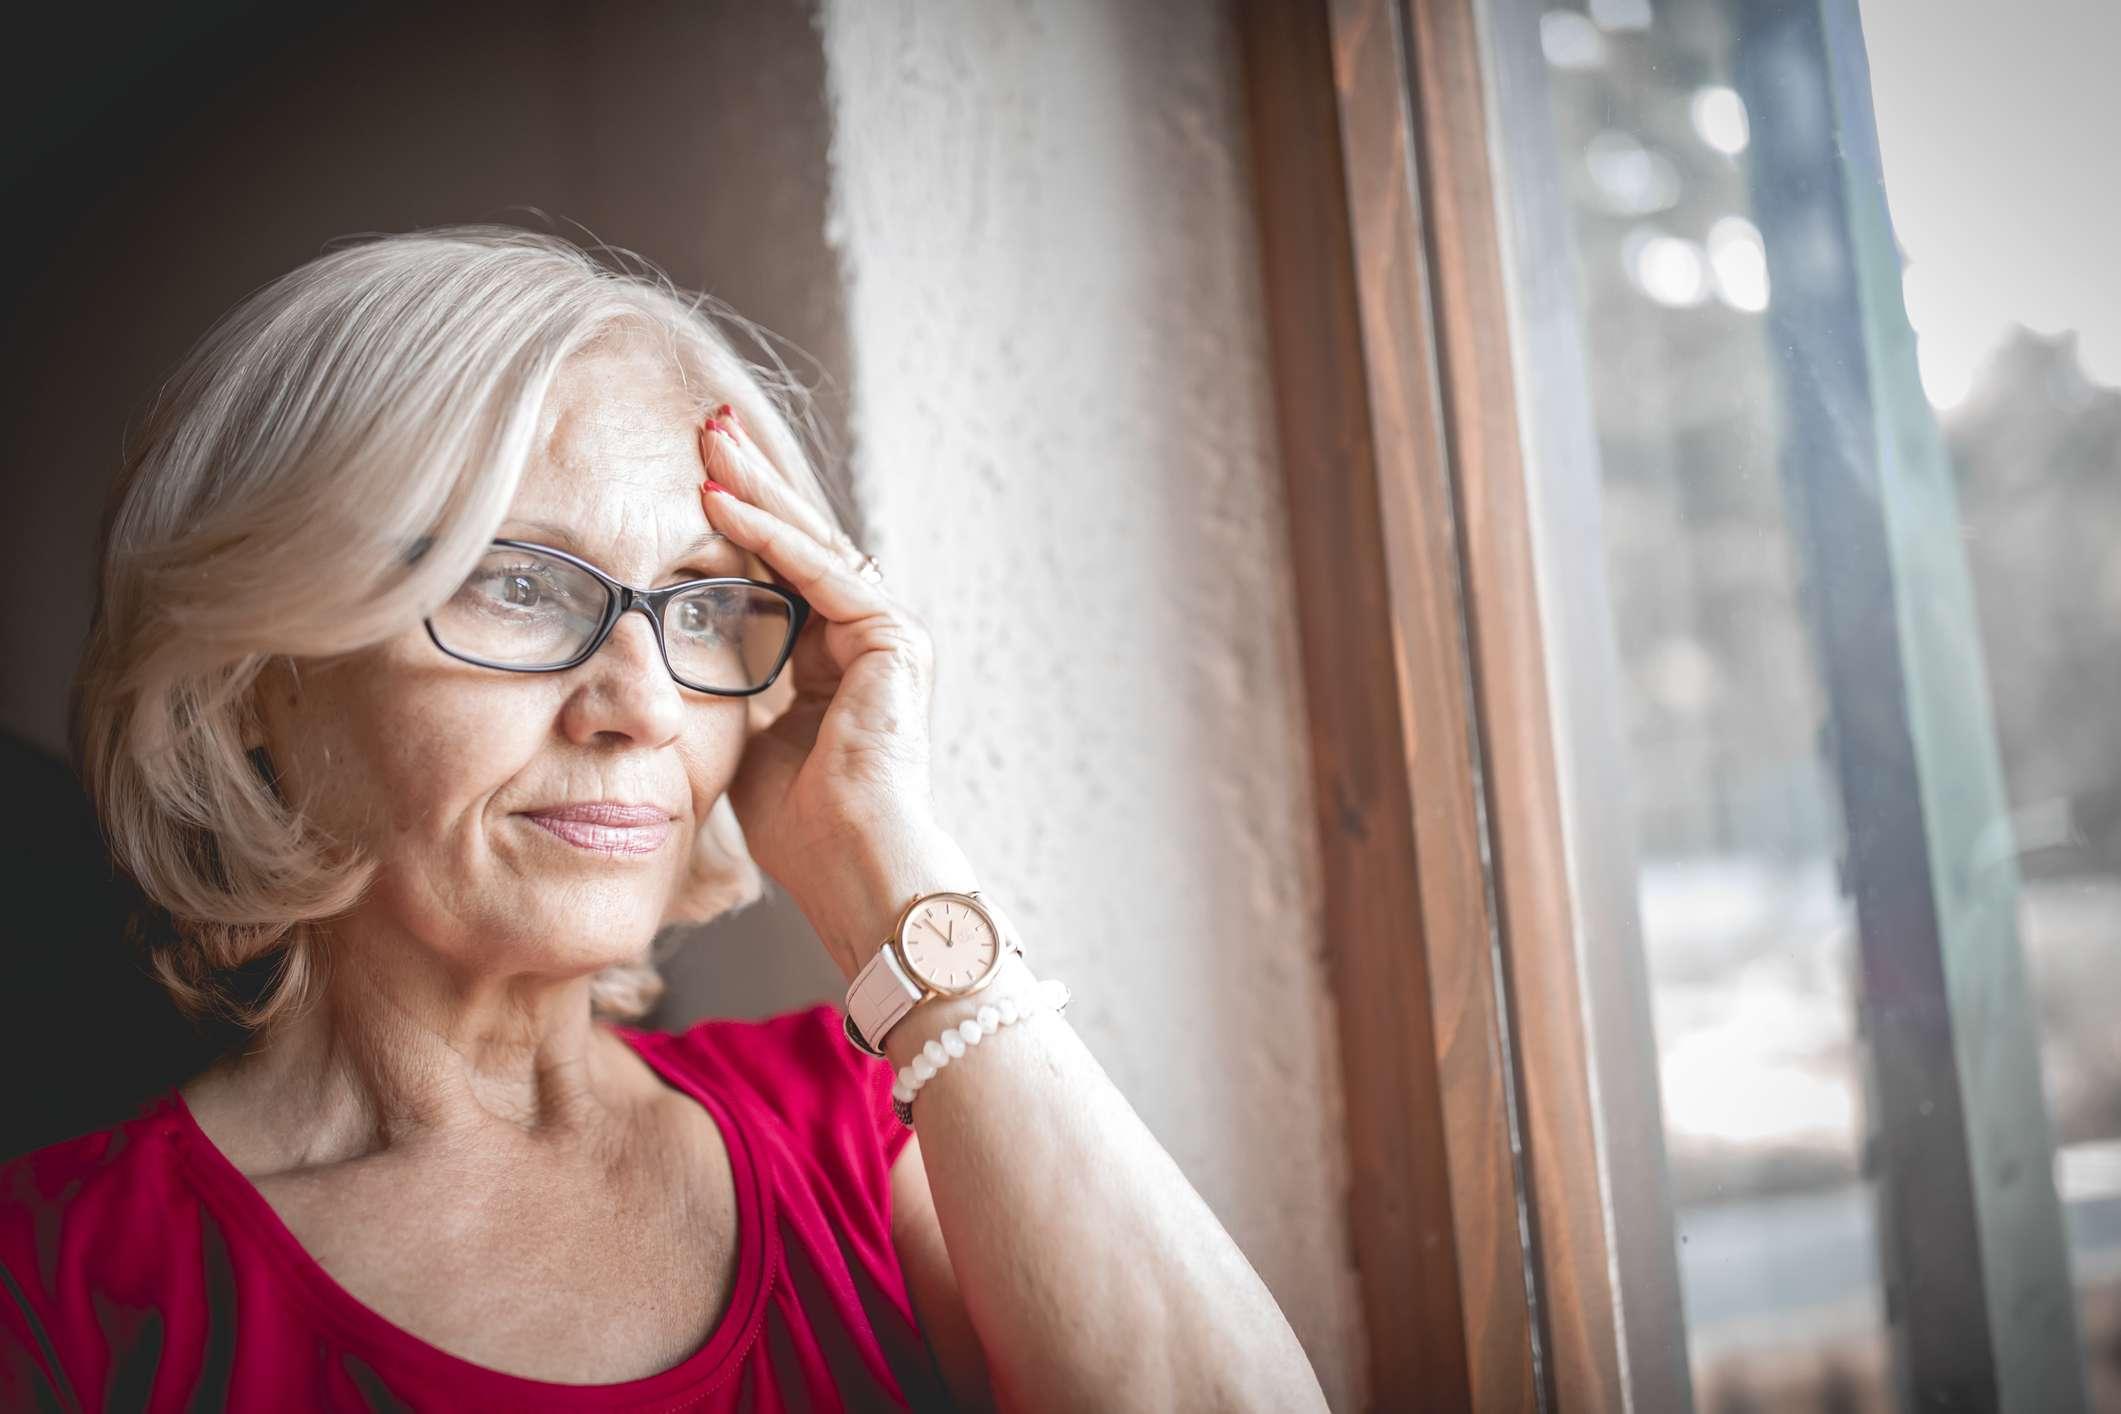 Brain cancer can cause severe head pain